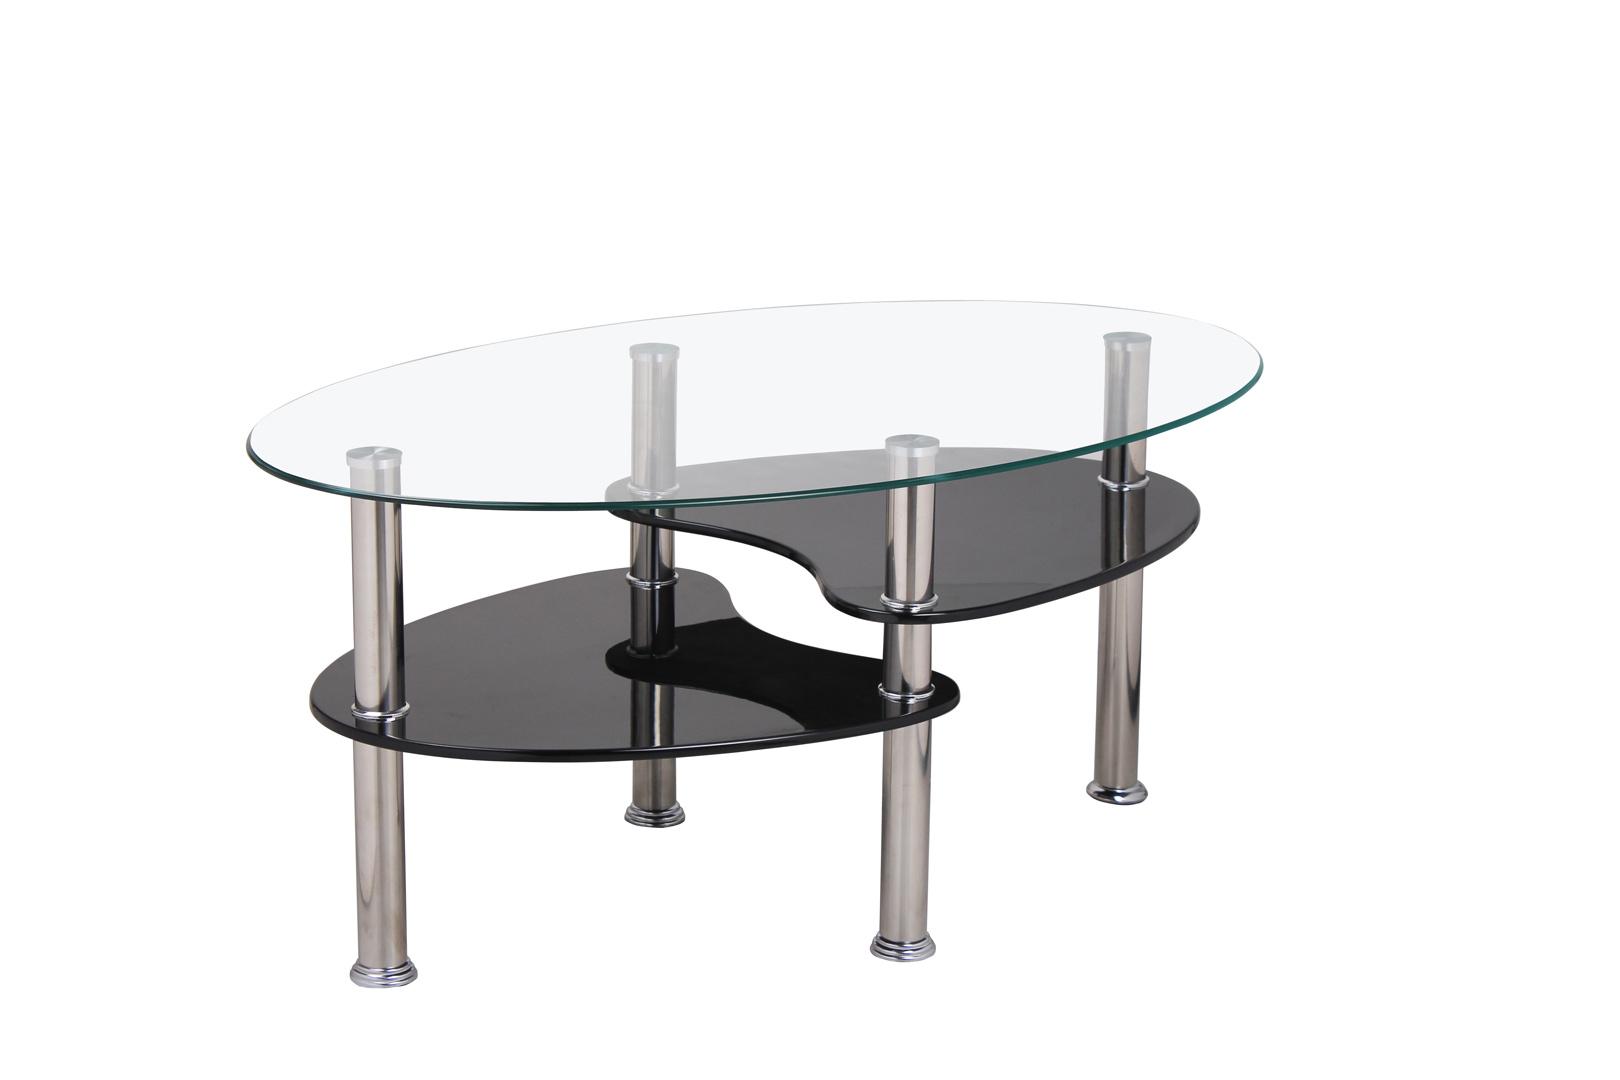 Table basse design ovale en verre MDF noir Konie   Matelpro 552dccd242ef